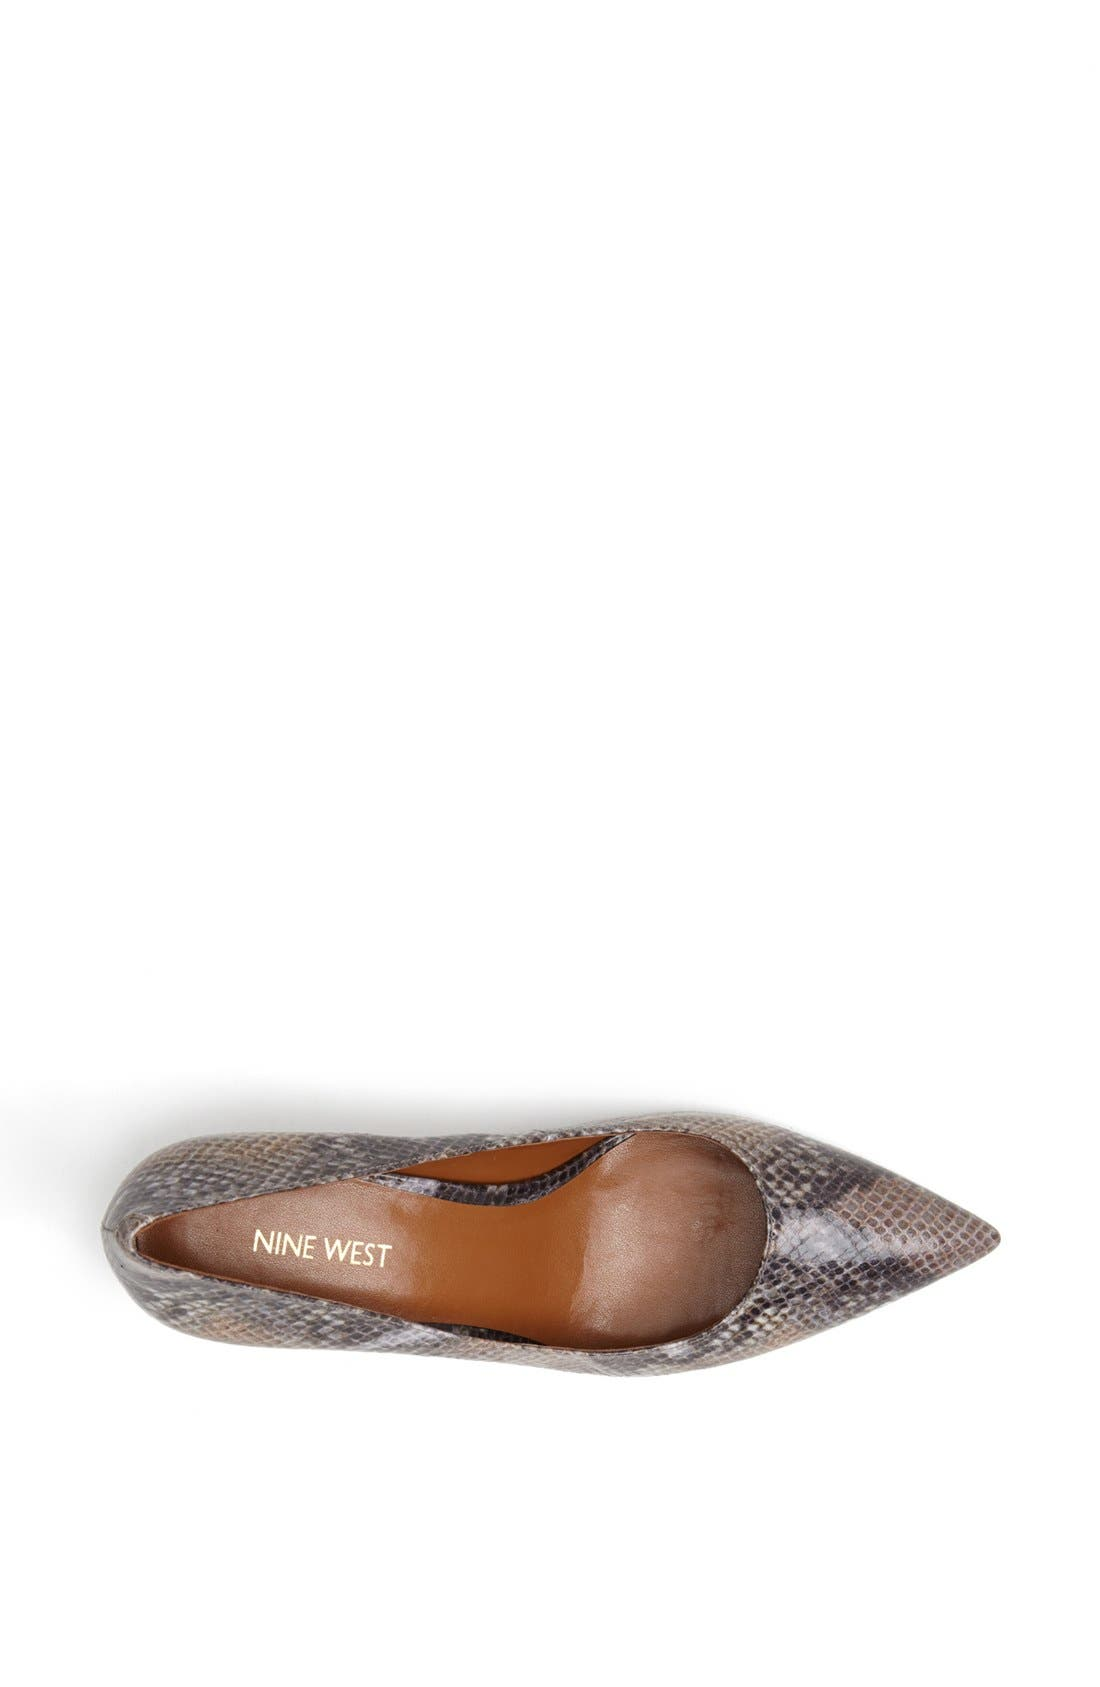 Alternate Image 3  - Nine West 'Margot' Pointy Toe Pump